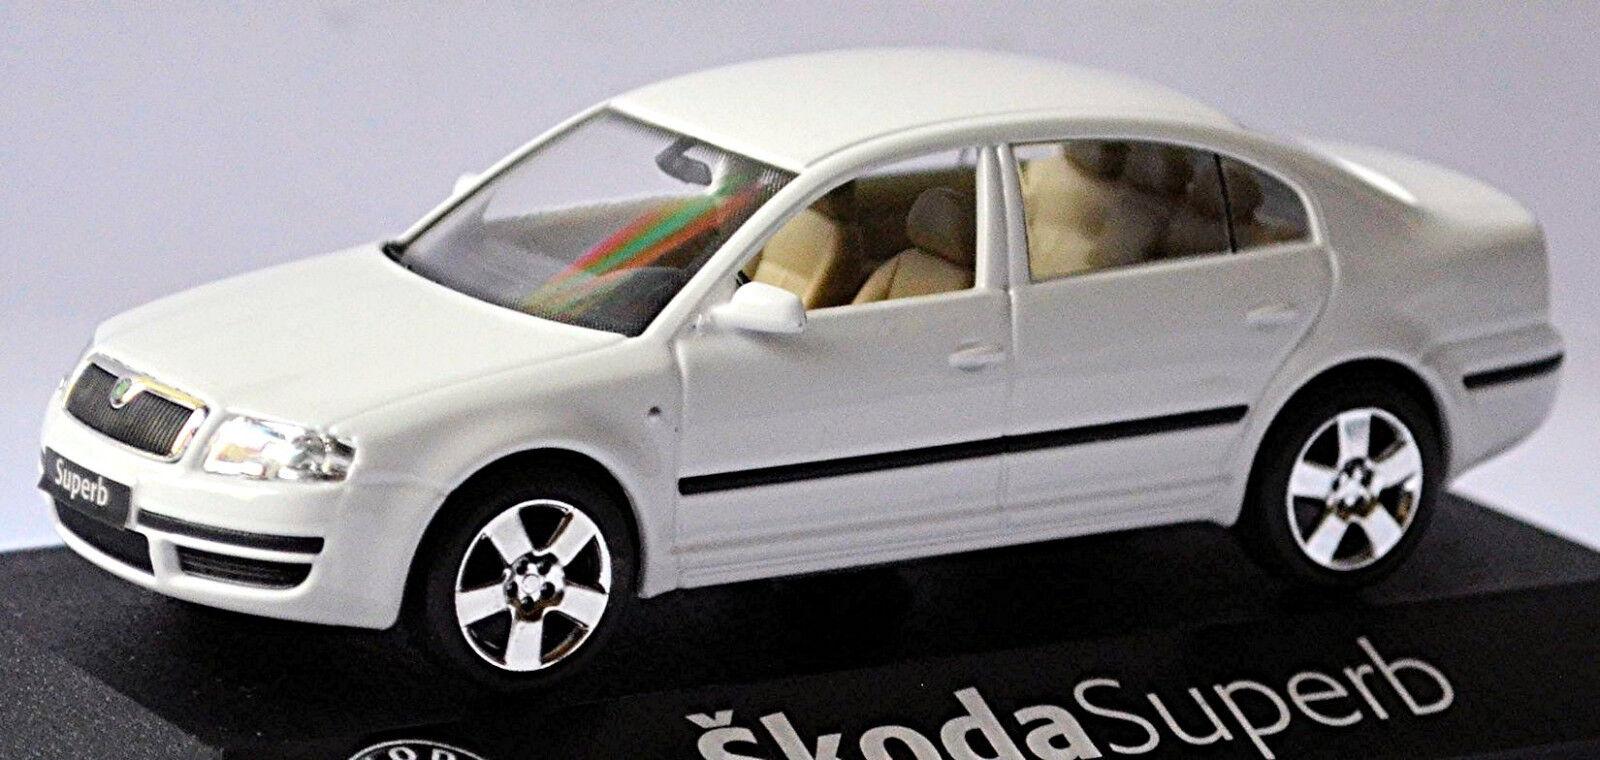 Skoda exquise Berline Type 3u4 modèle de soins 2006-08 Blanc blanc 1 43 KADEN